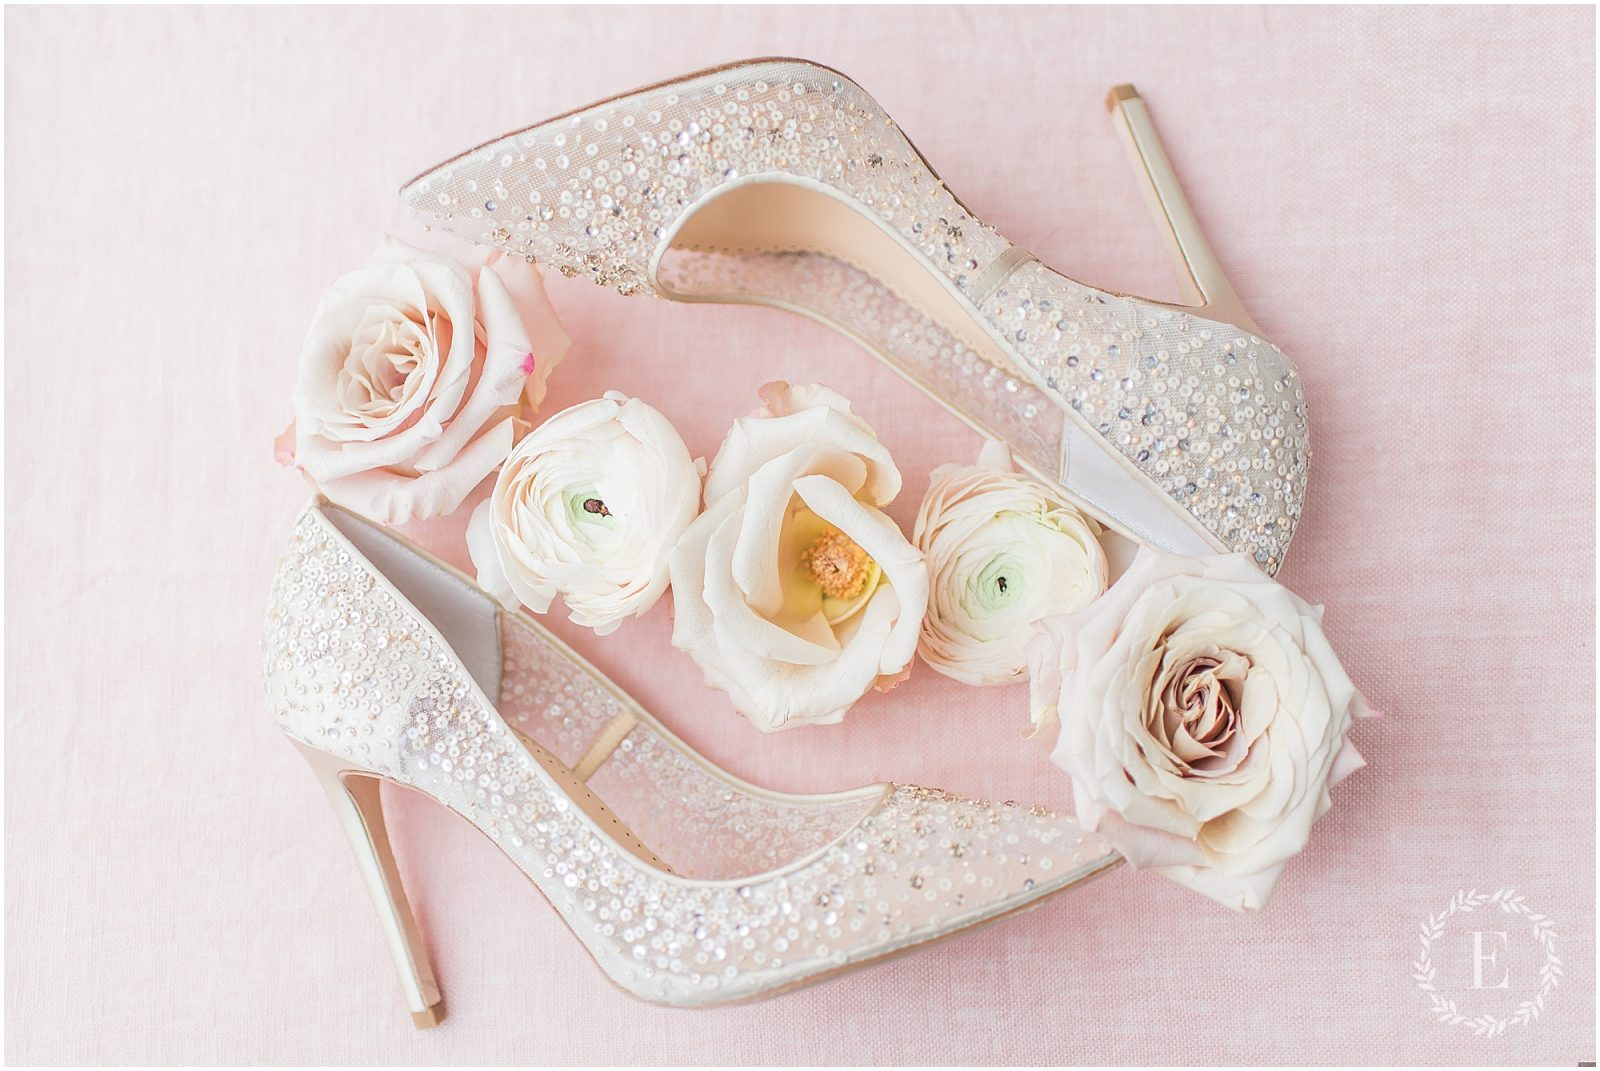 57 - Bella Belle for Fairy Dreams Bridal - PhotosbyEmmaH 2019.jpg